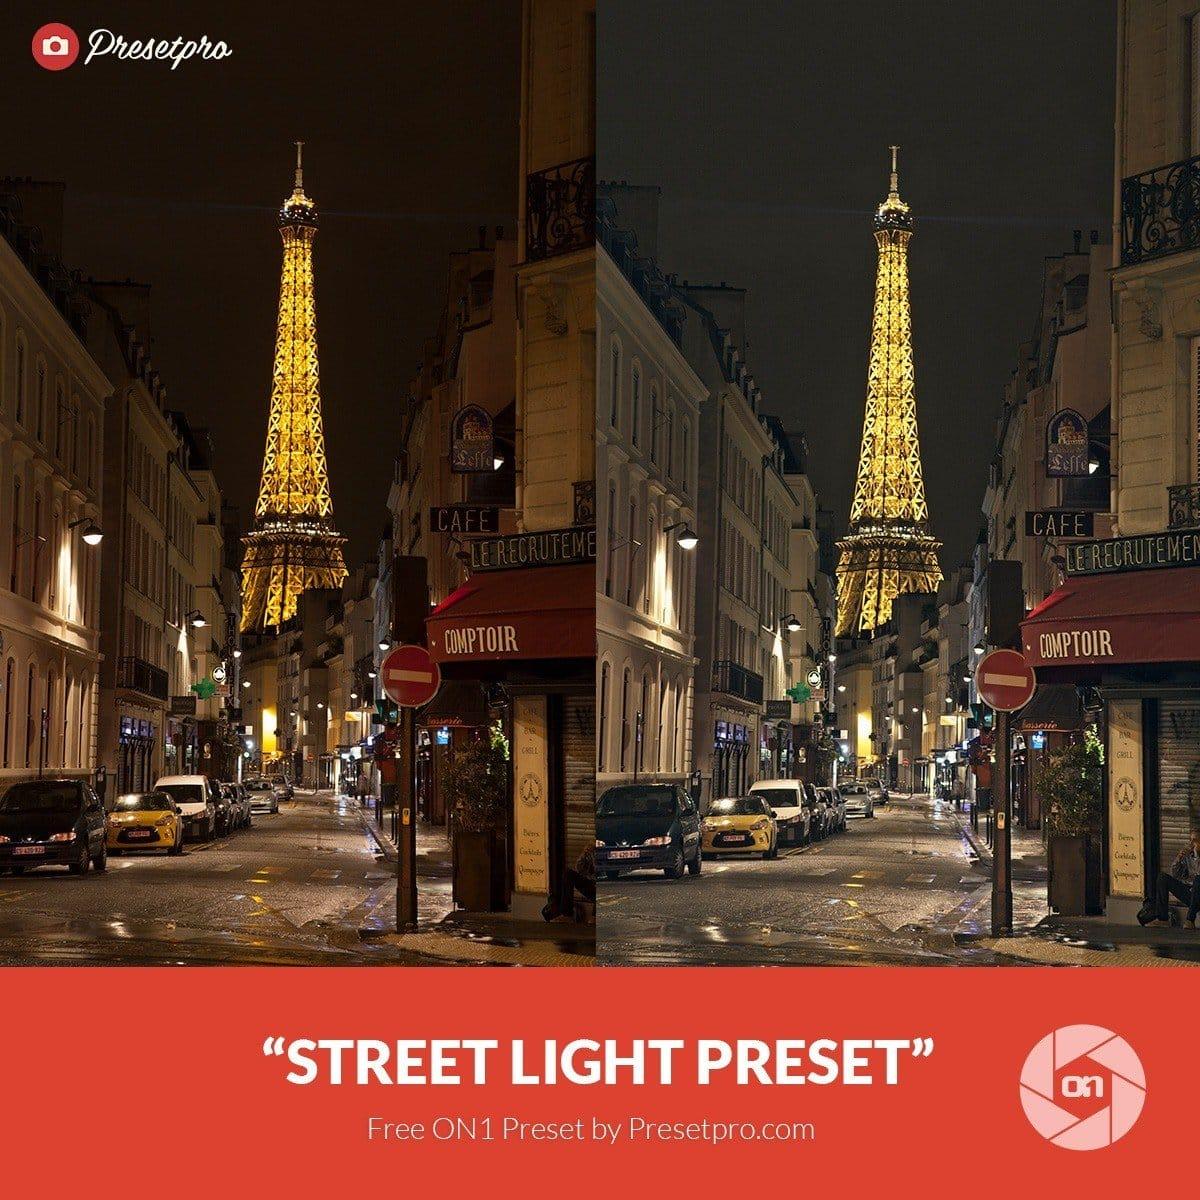 Free-On1-Preset-Street-Lights-Presetpro.com